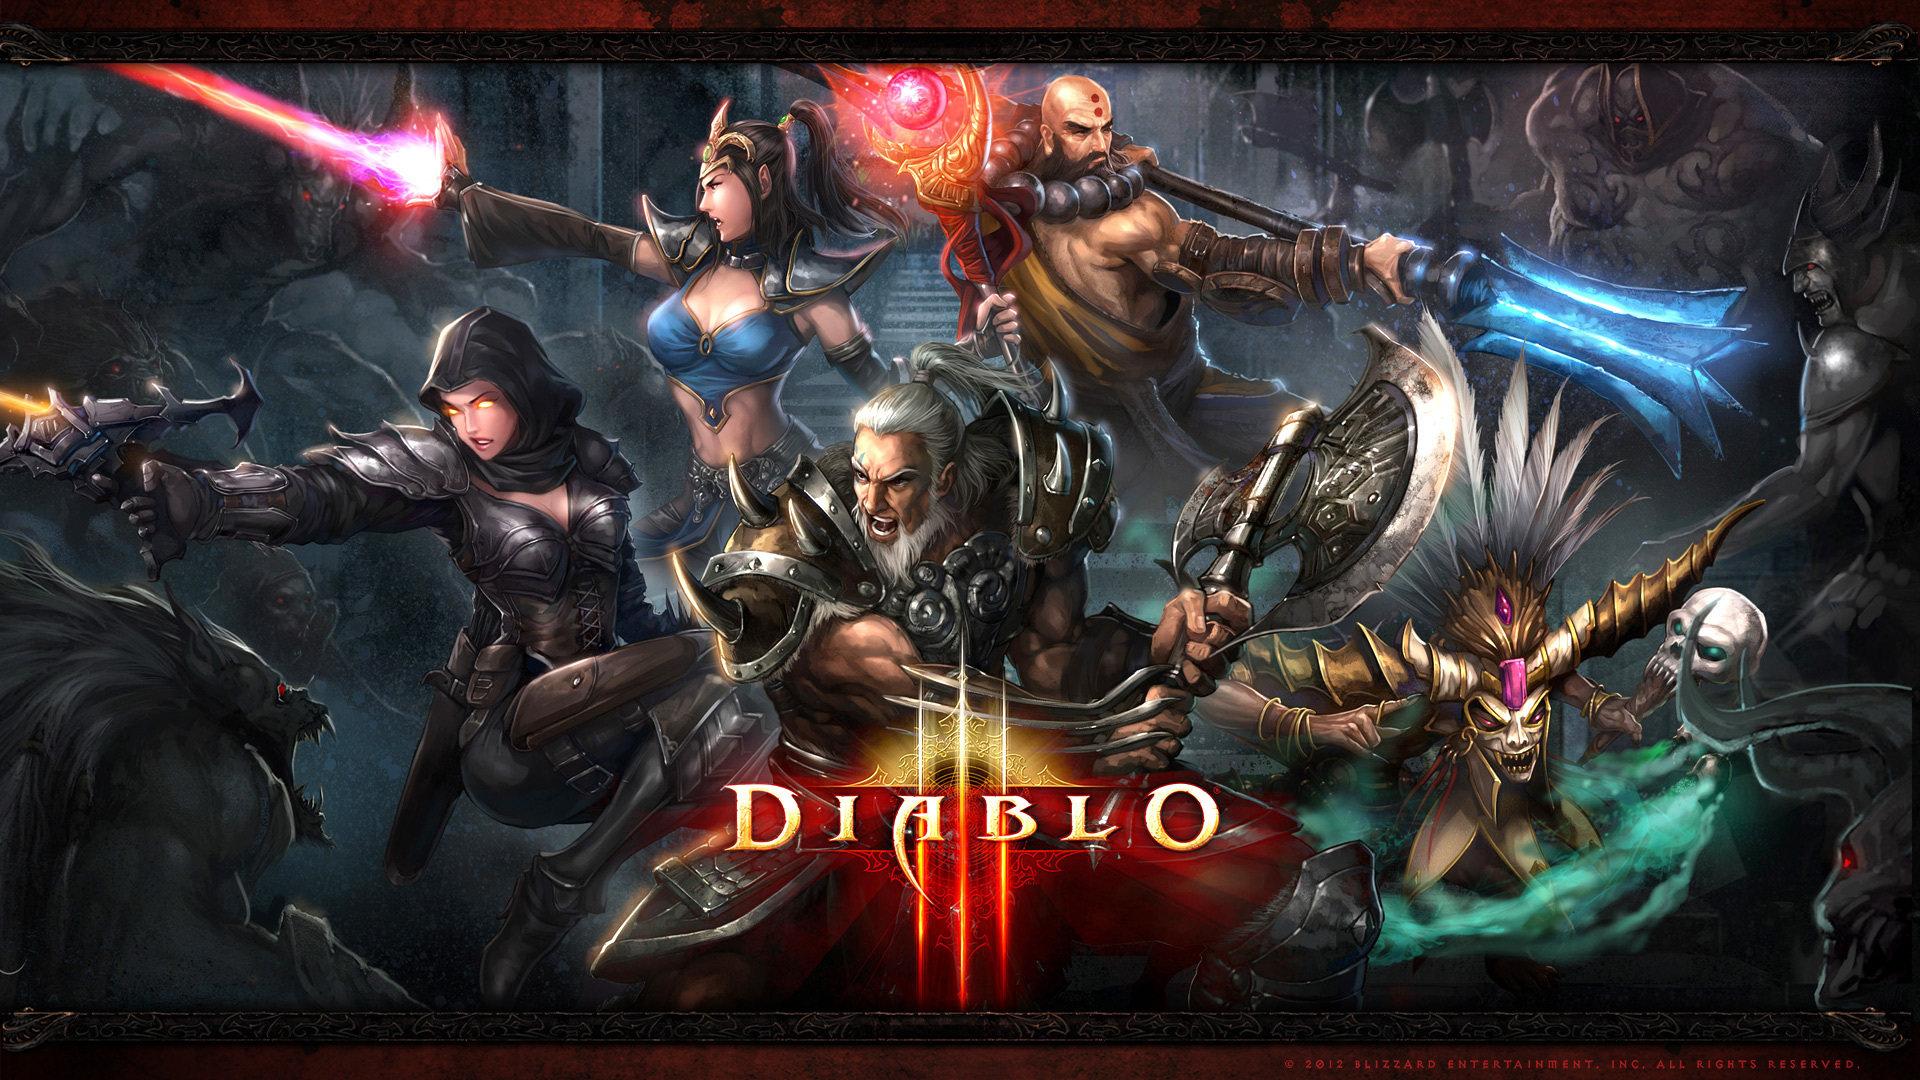 High Resolution Diablo 3 Full Hd 1920x1080 Wallpaper Id 30860 For